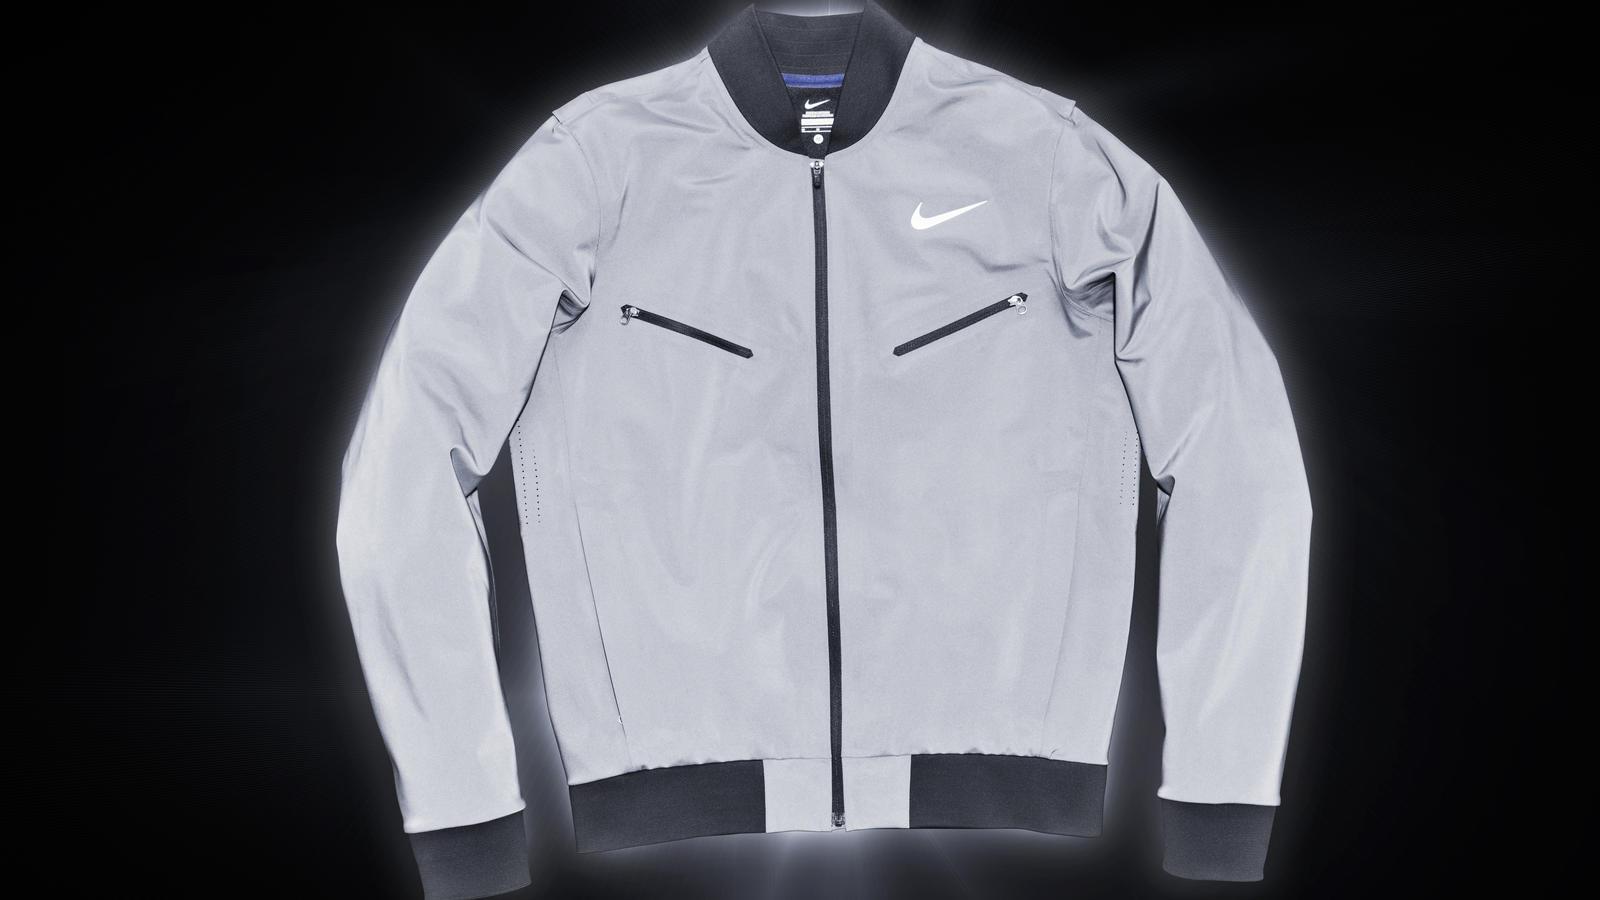 Nike Tennis Vapor Flash Rafa Jacket (with flash)